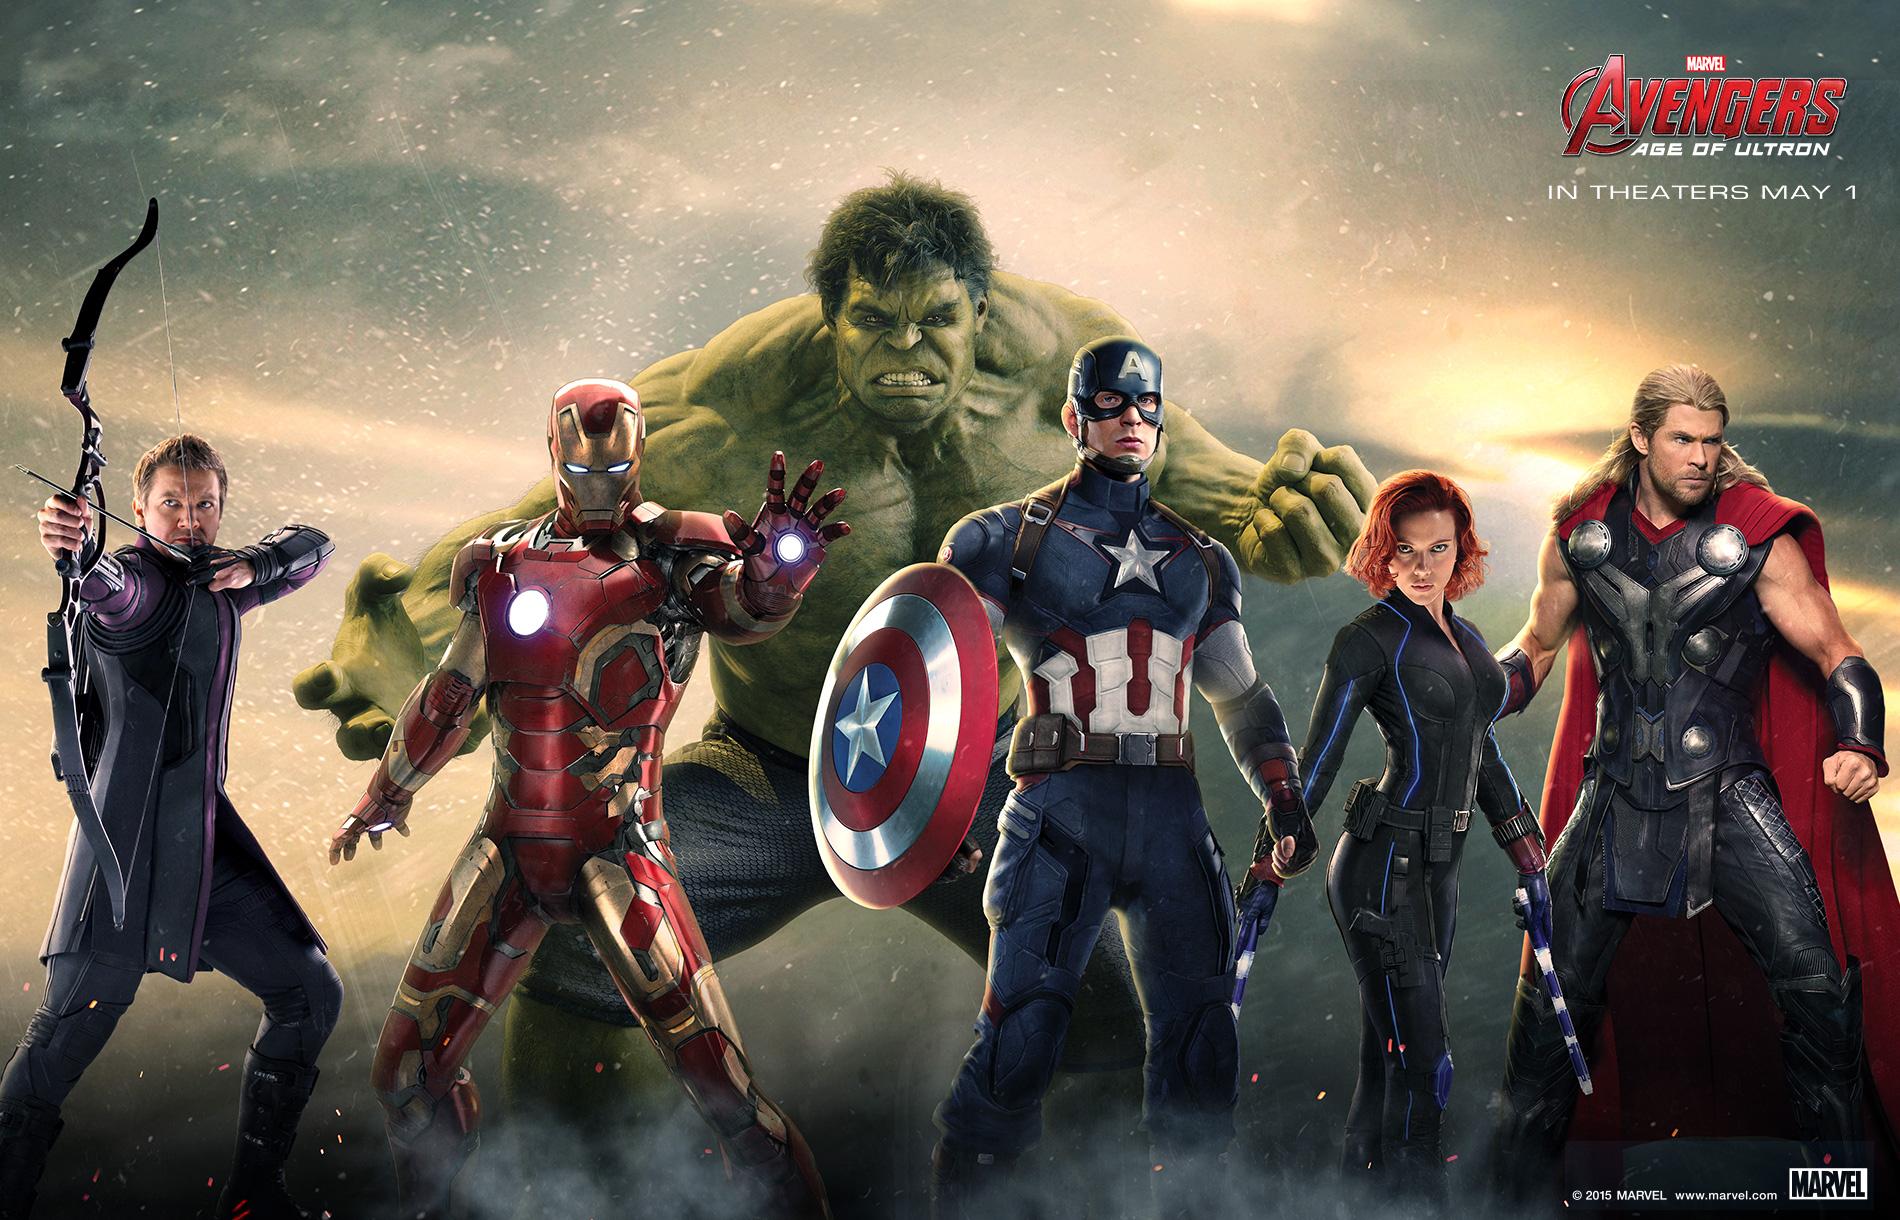 Avengers Lre dUltron Audi sort le grand jeu spot TV 1900x1220